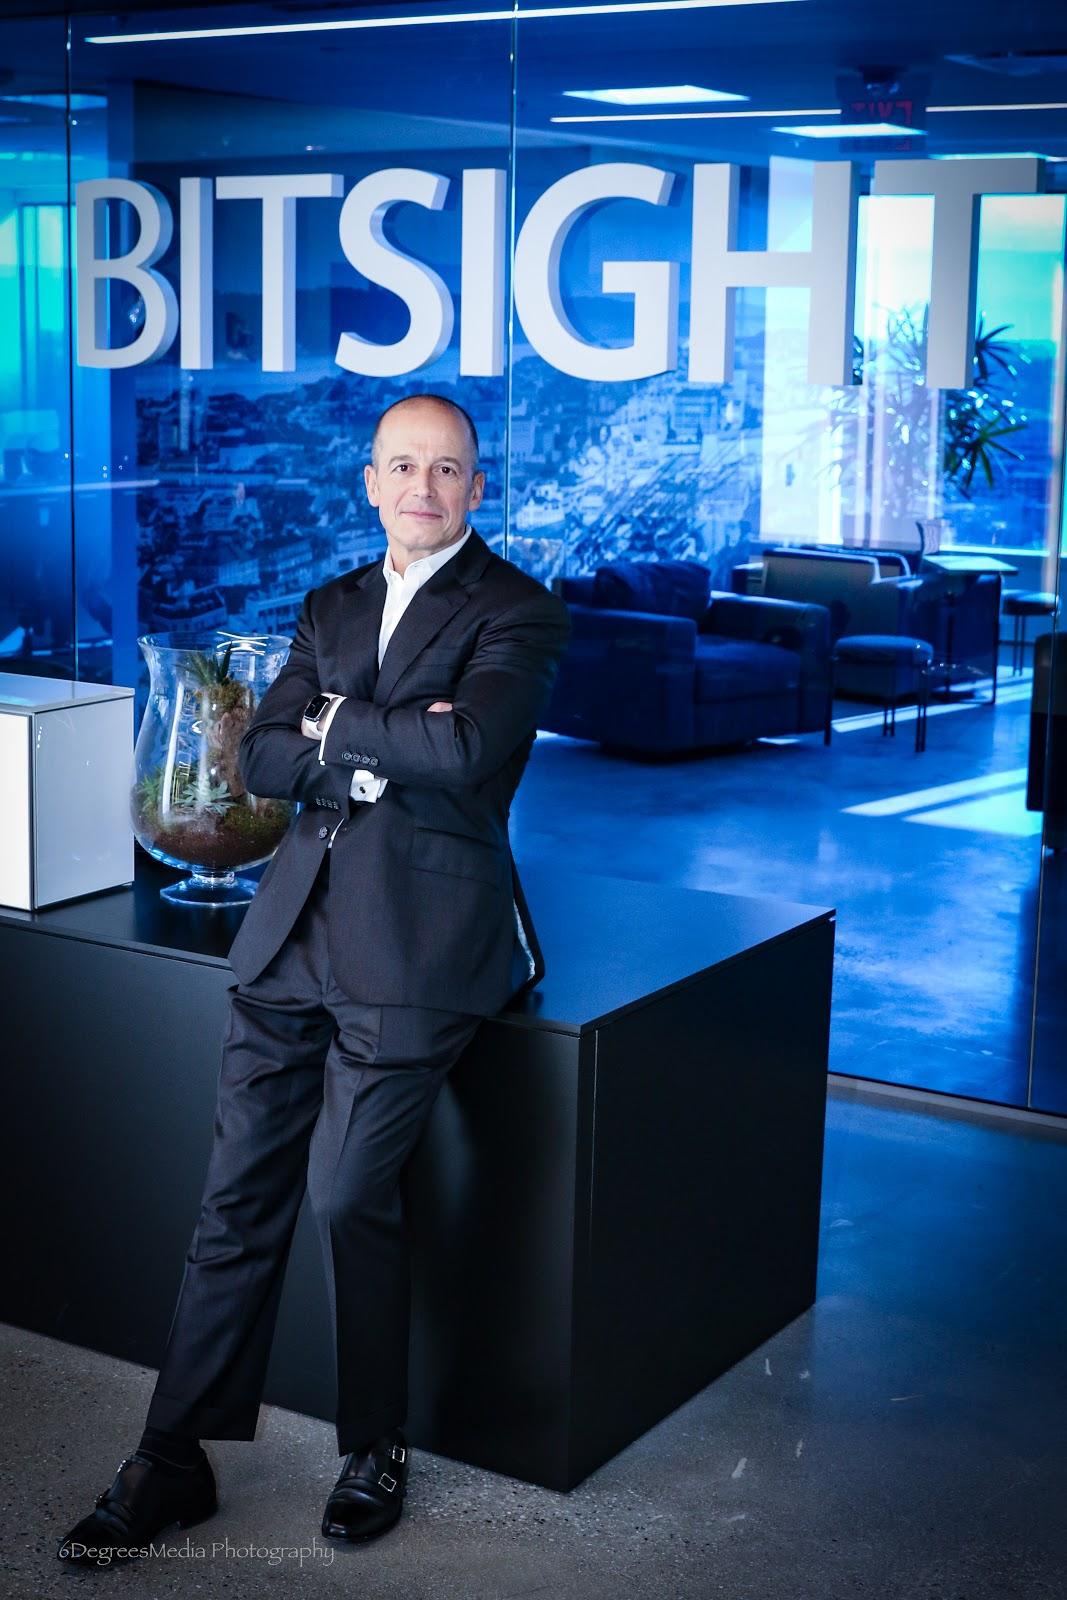 BitSight CEO Stephen Harvey